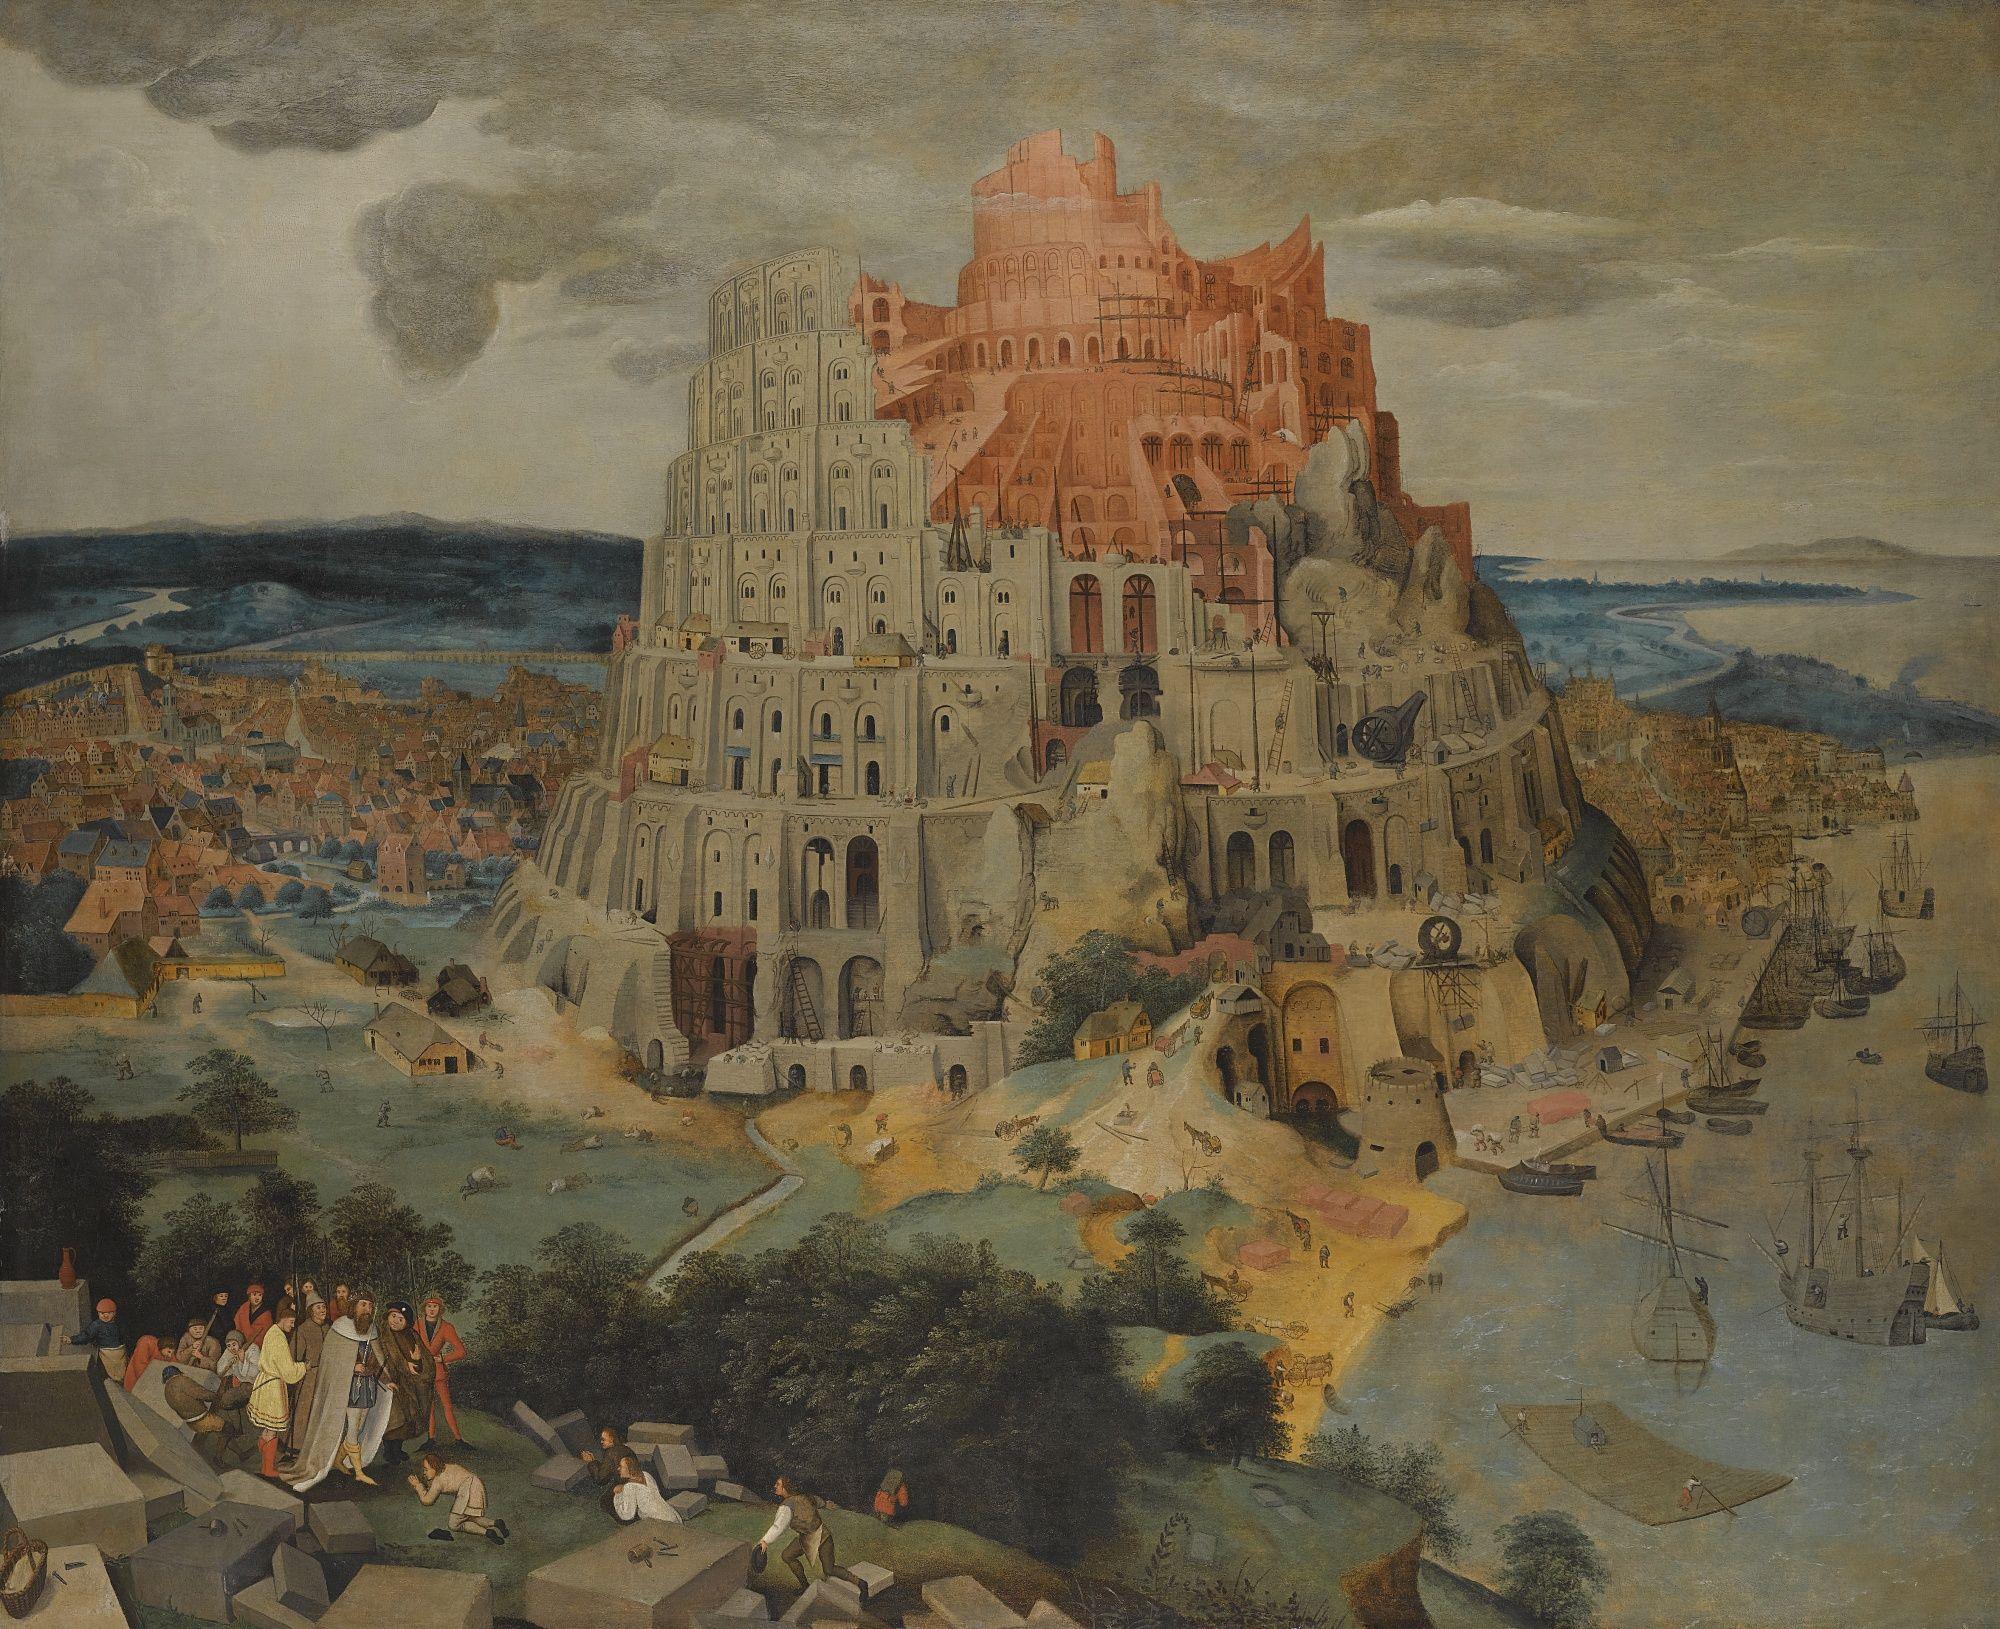 pieter bruegel tower of babel - Google Search